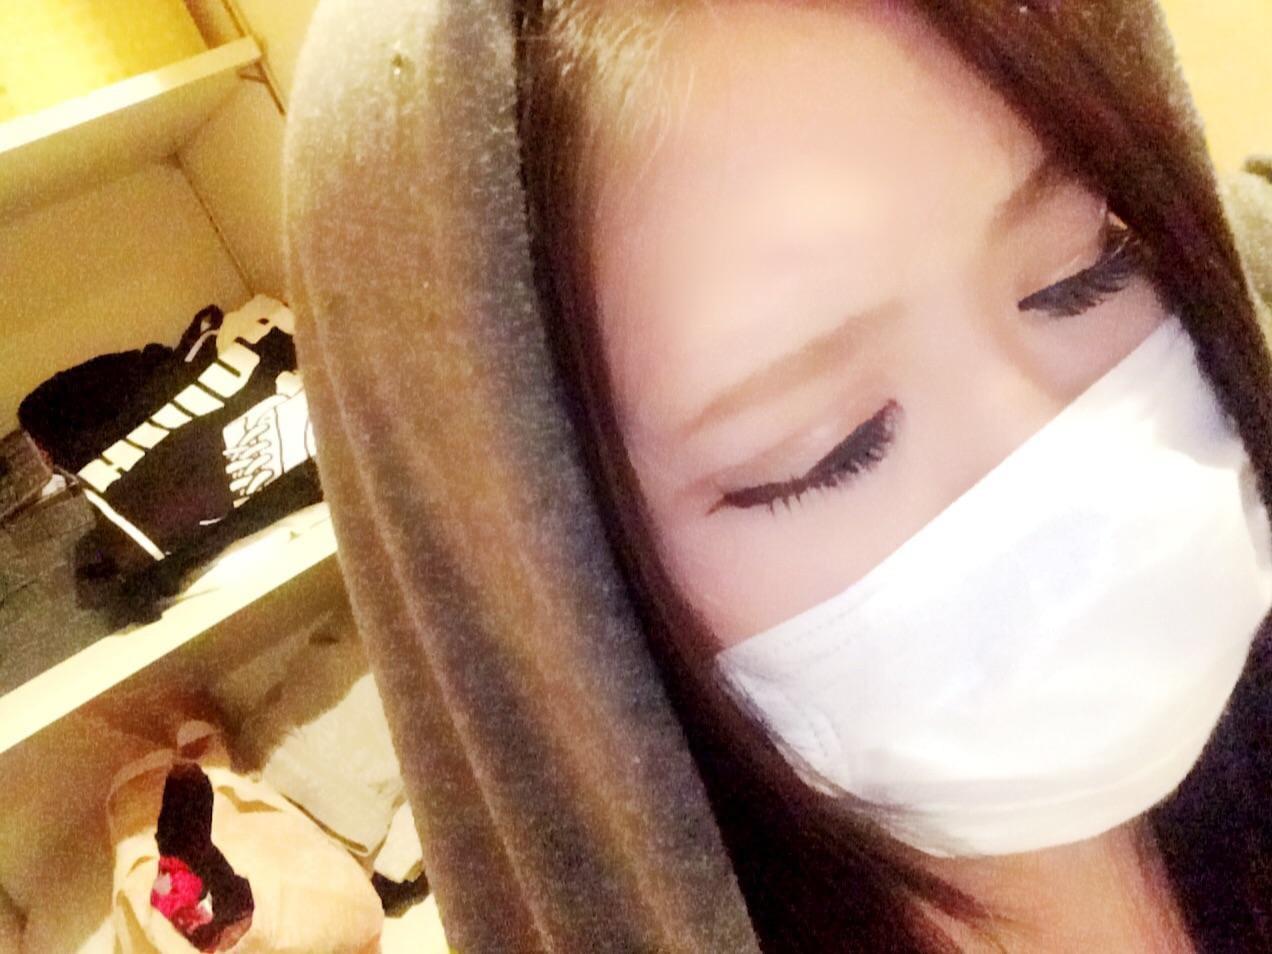 「♡(´;Д;`)♡」02/28(木) 17:31 | つばきの写メ・風俗動画